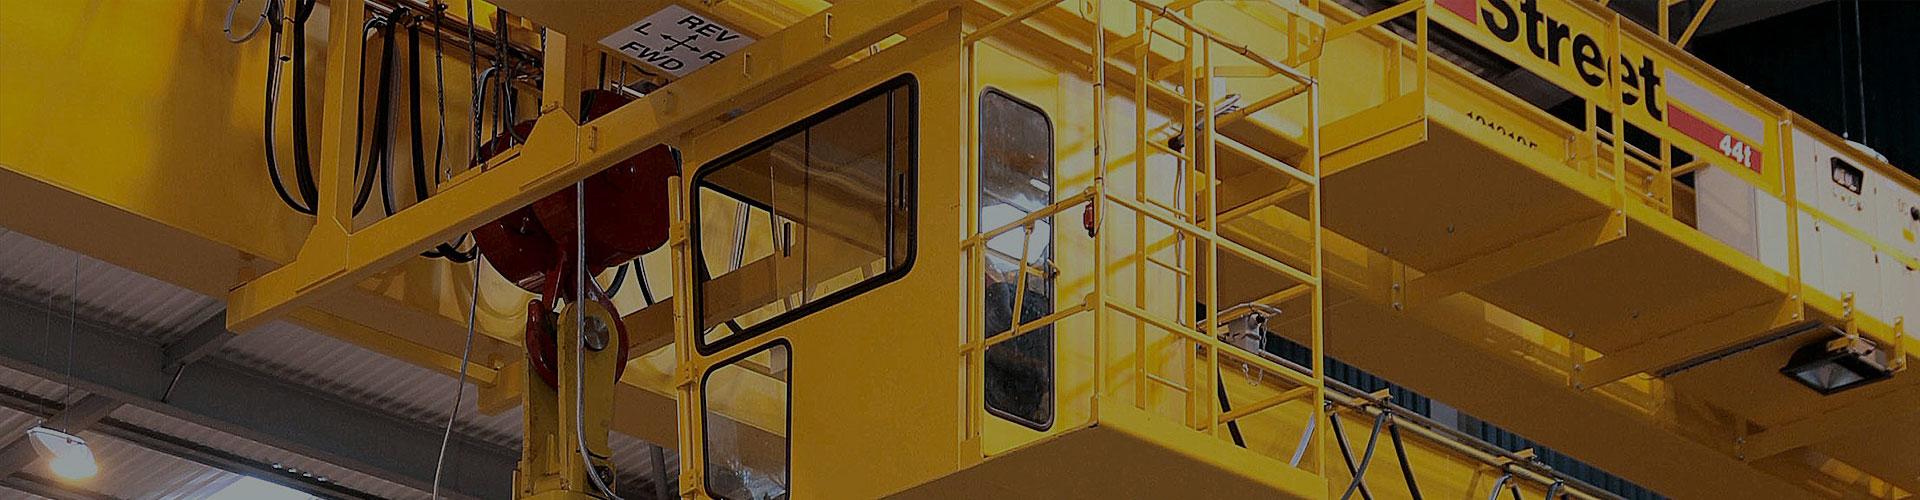 overhead-crane-training